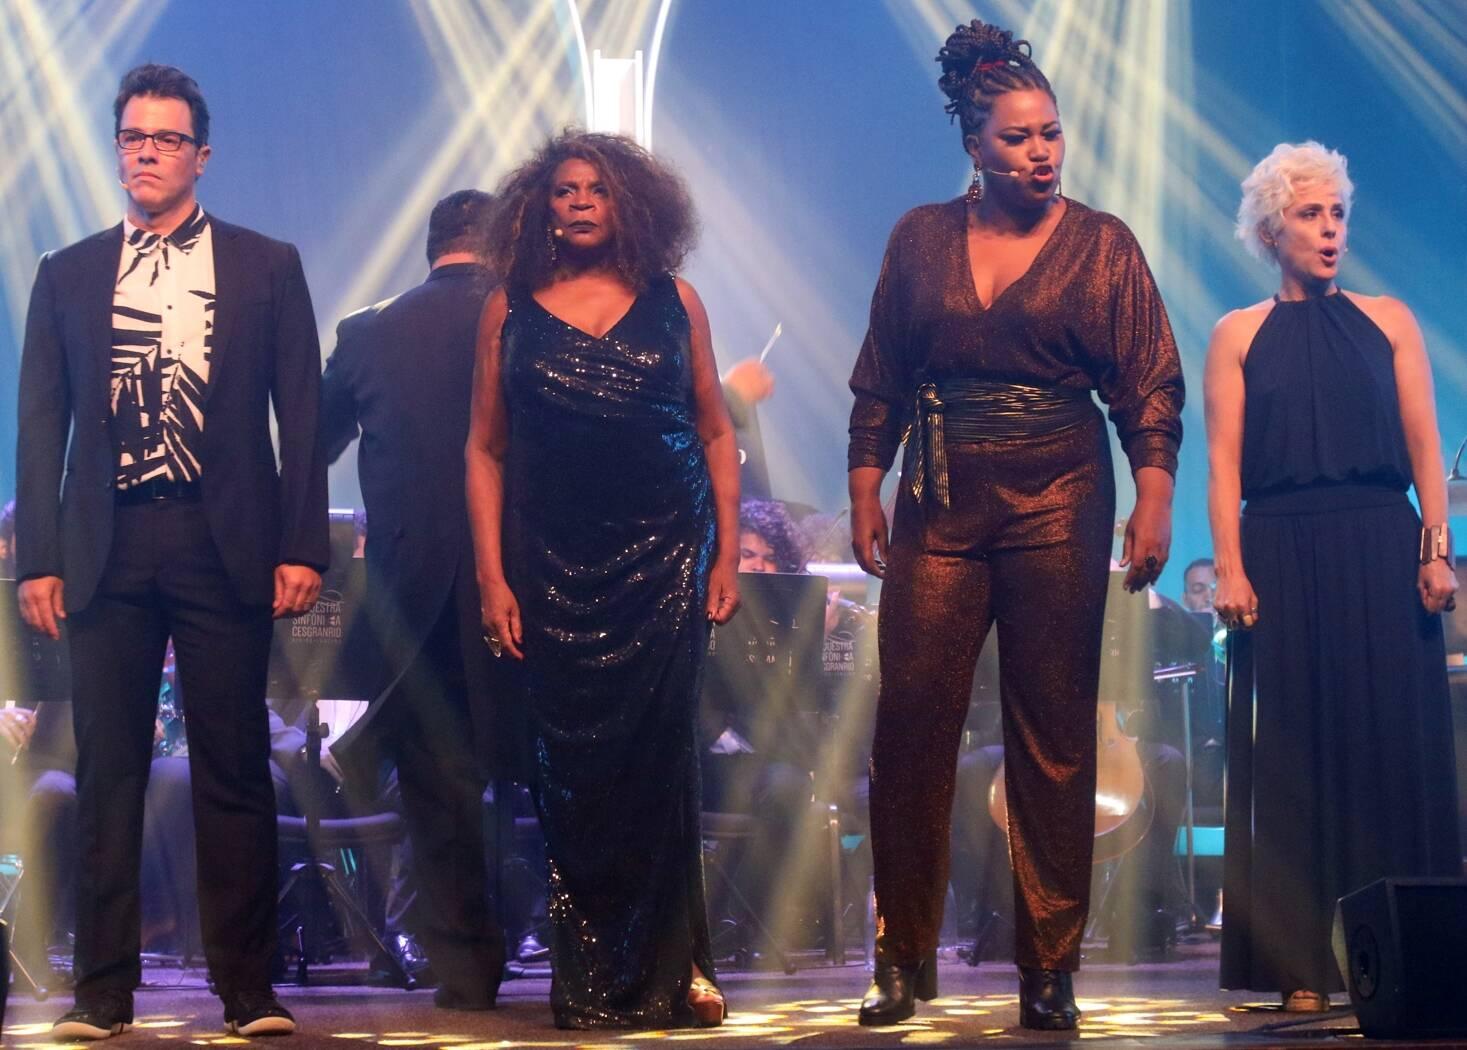 No palco os atores: Claudio Lins, Zezé Motta, Lilian Valeska e Soraya Ravenle /Foto: Eny Miranda